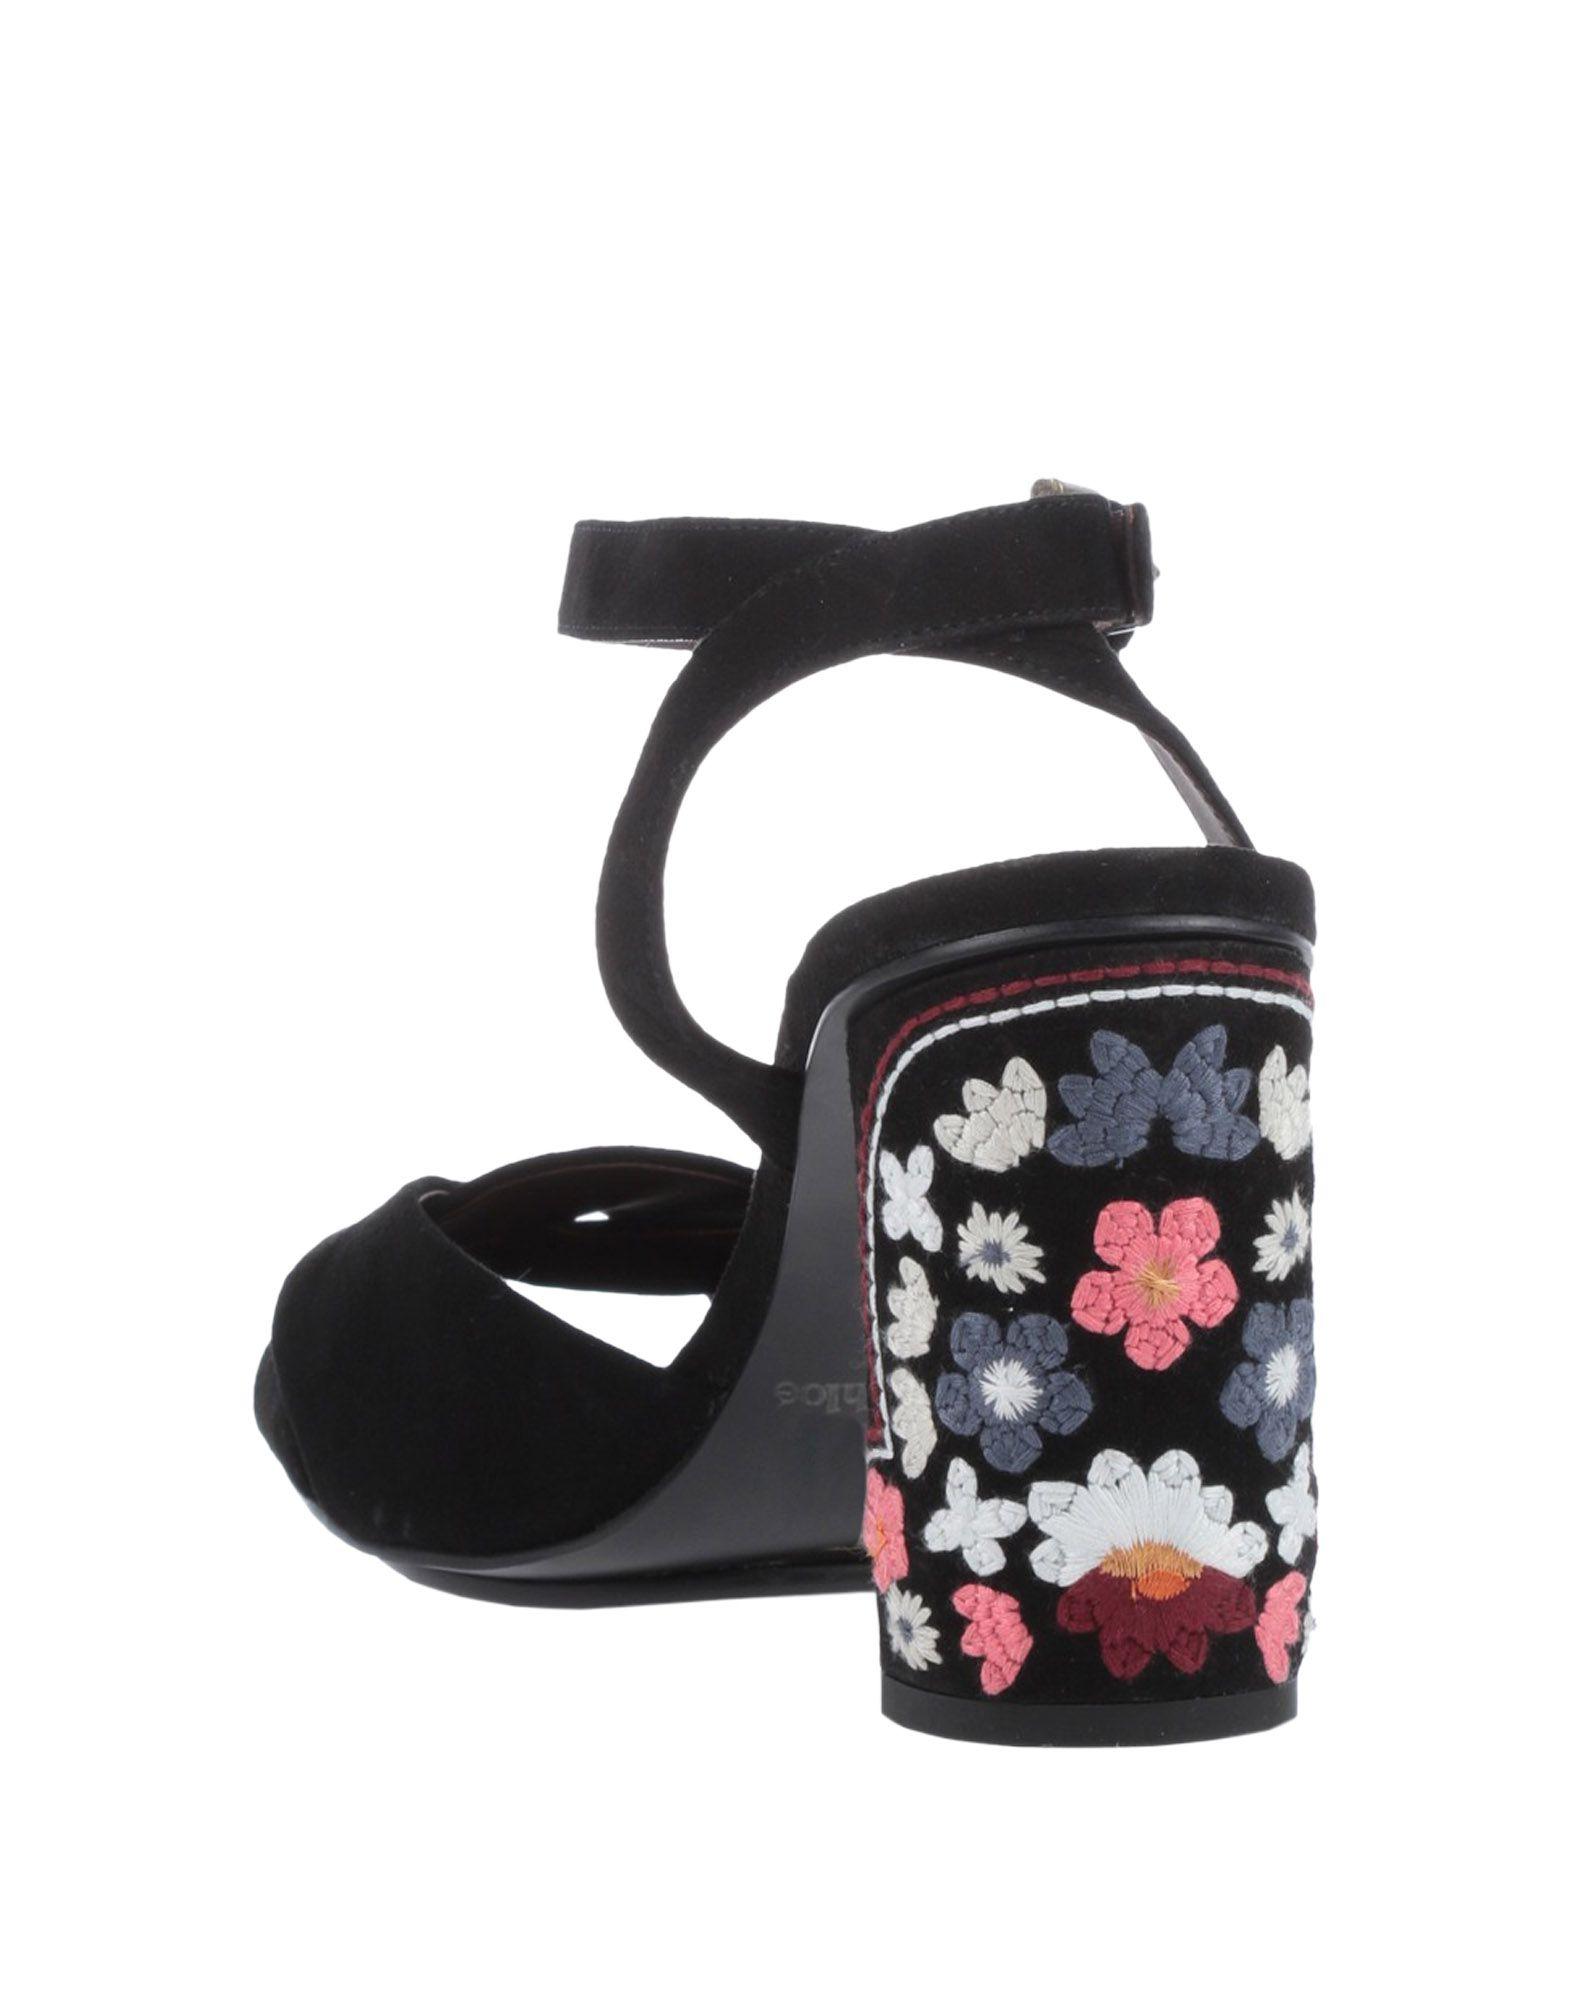 Stilvolle billige Schuhe See  By Chloé Sandalen Damen  See 11520778JU 8ca0c6